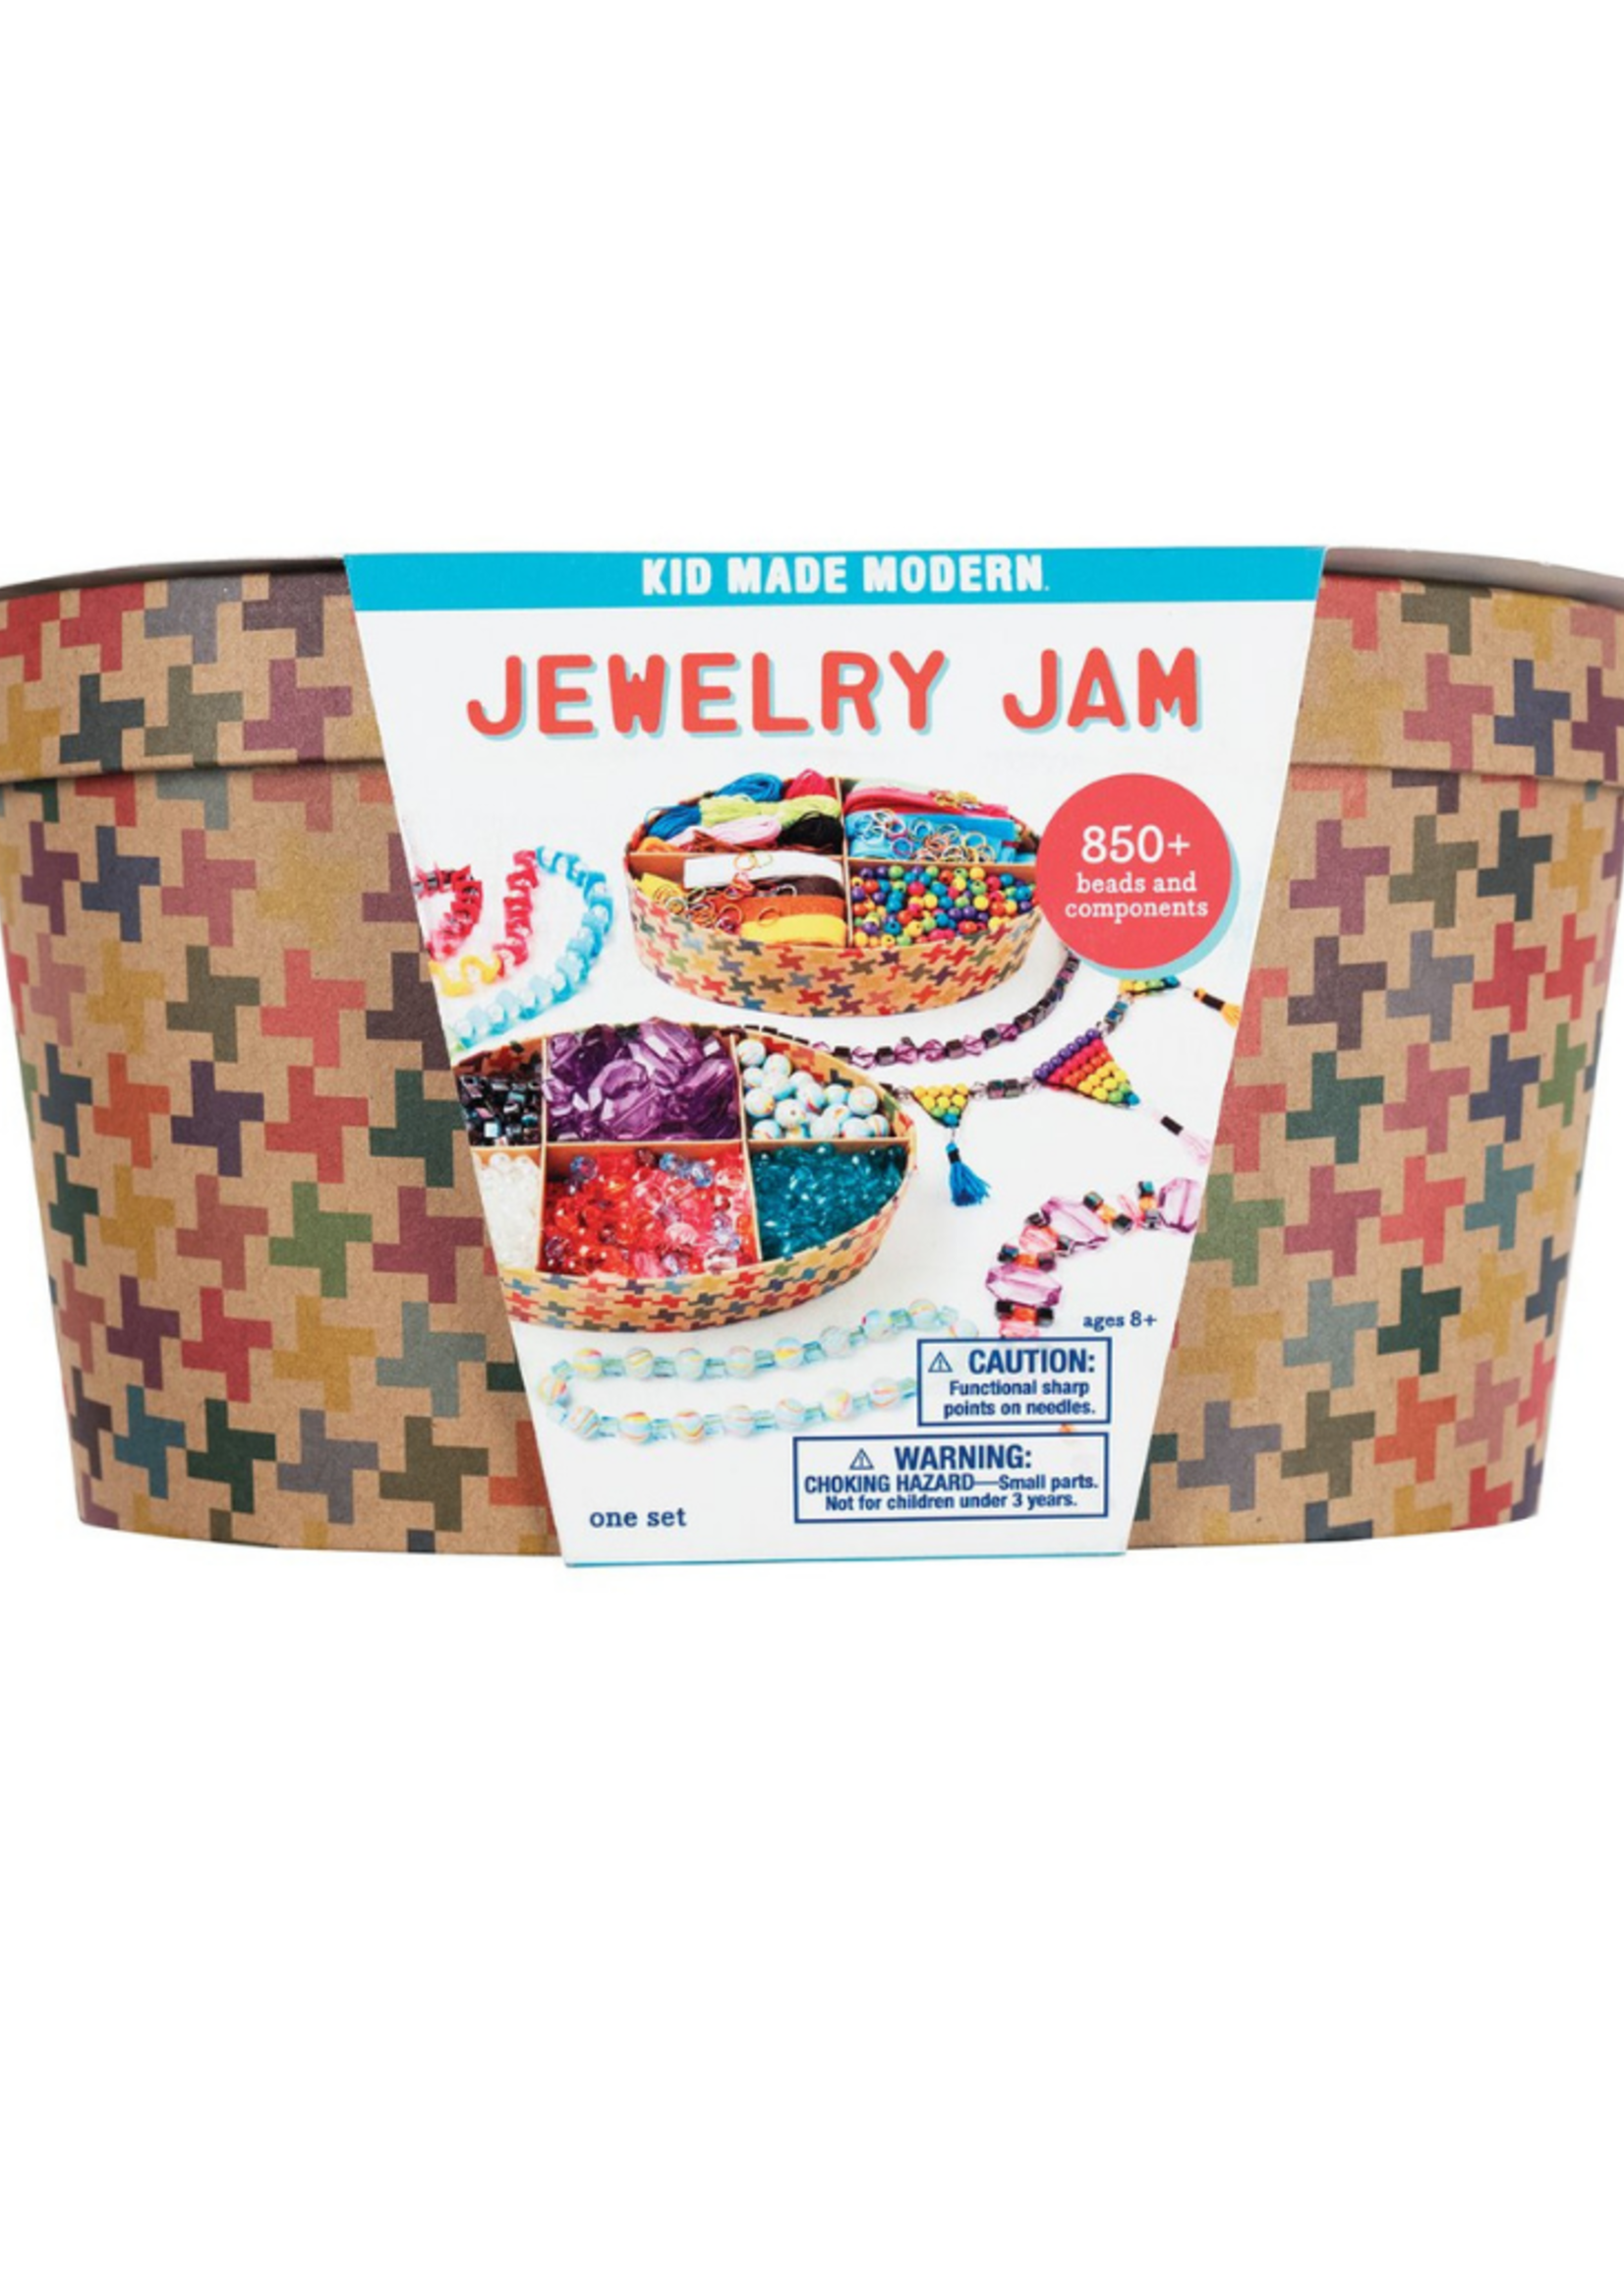 Kids Made Modern Jewelry Jam Jewelry Making Kit